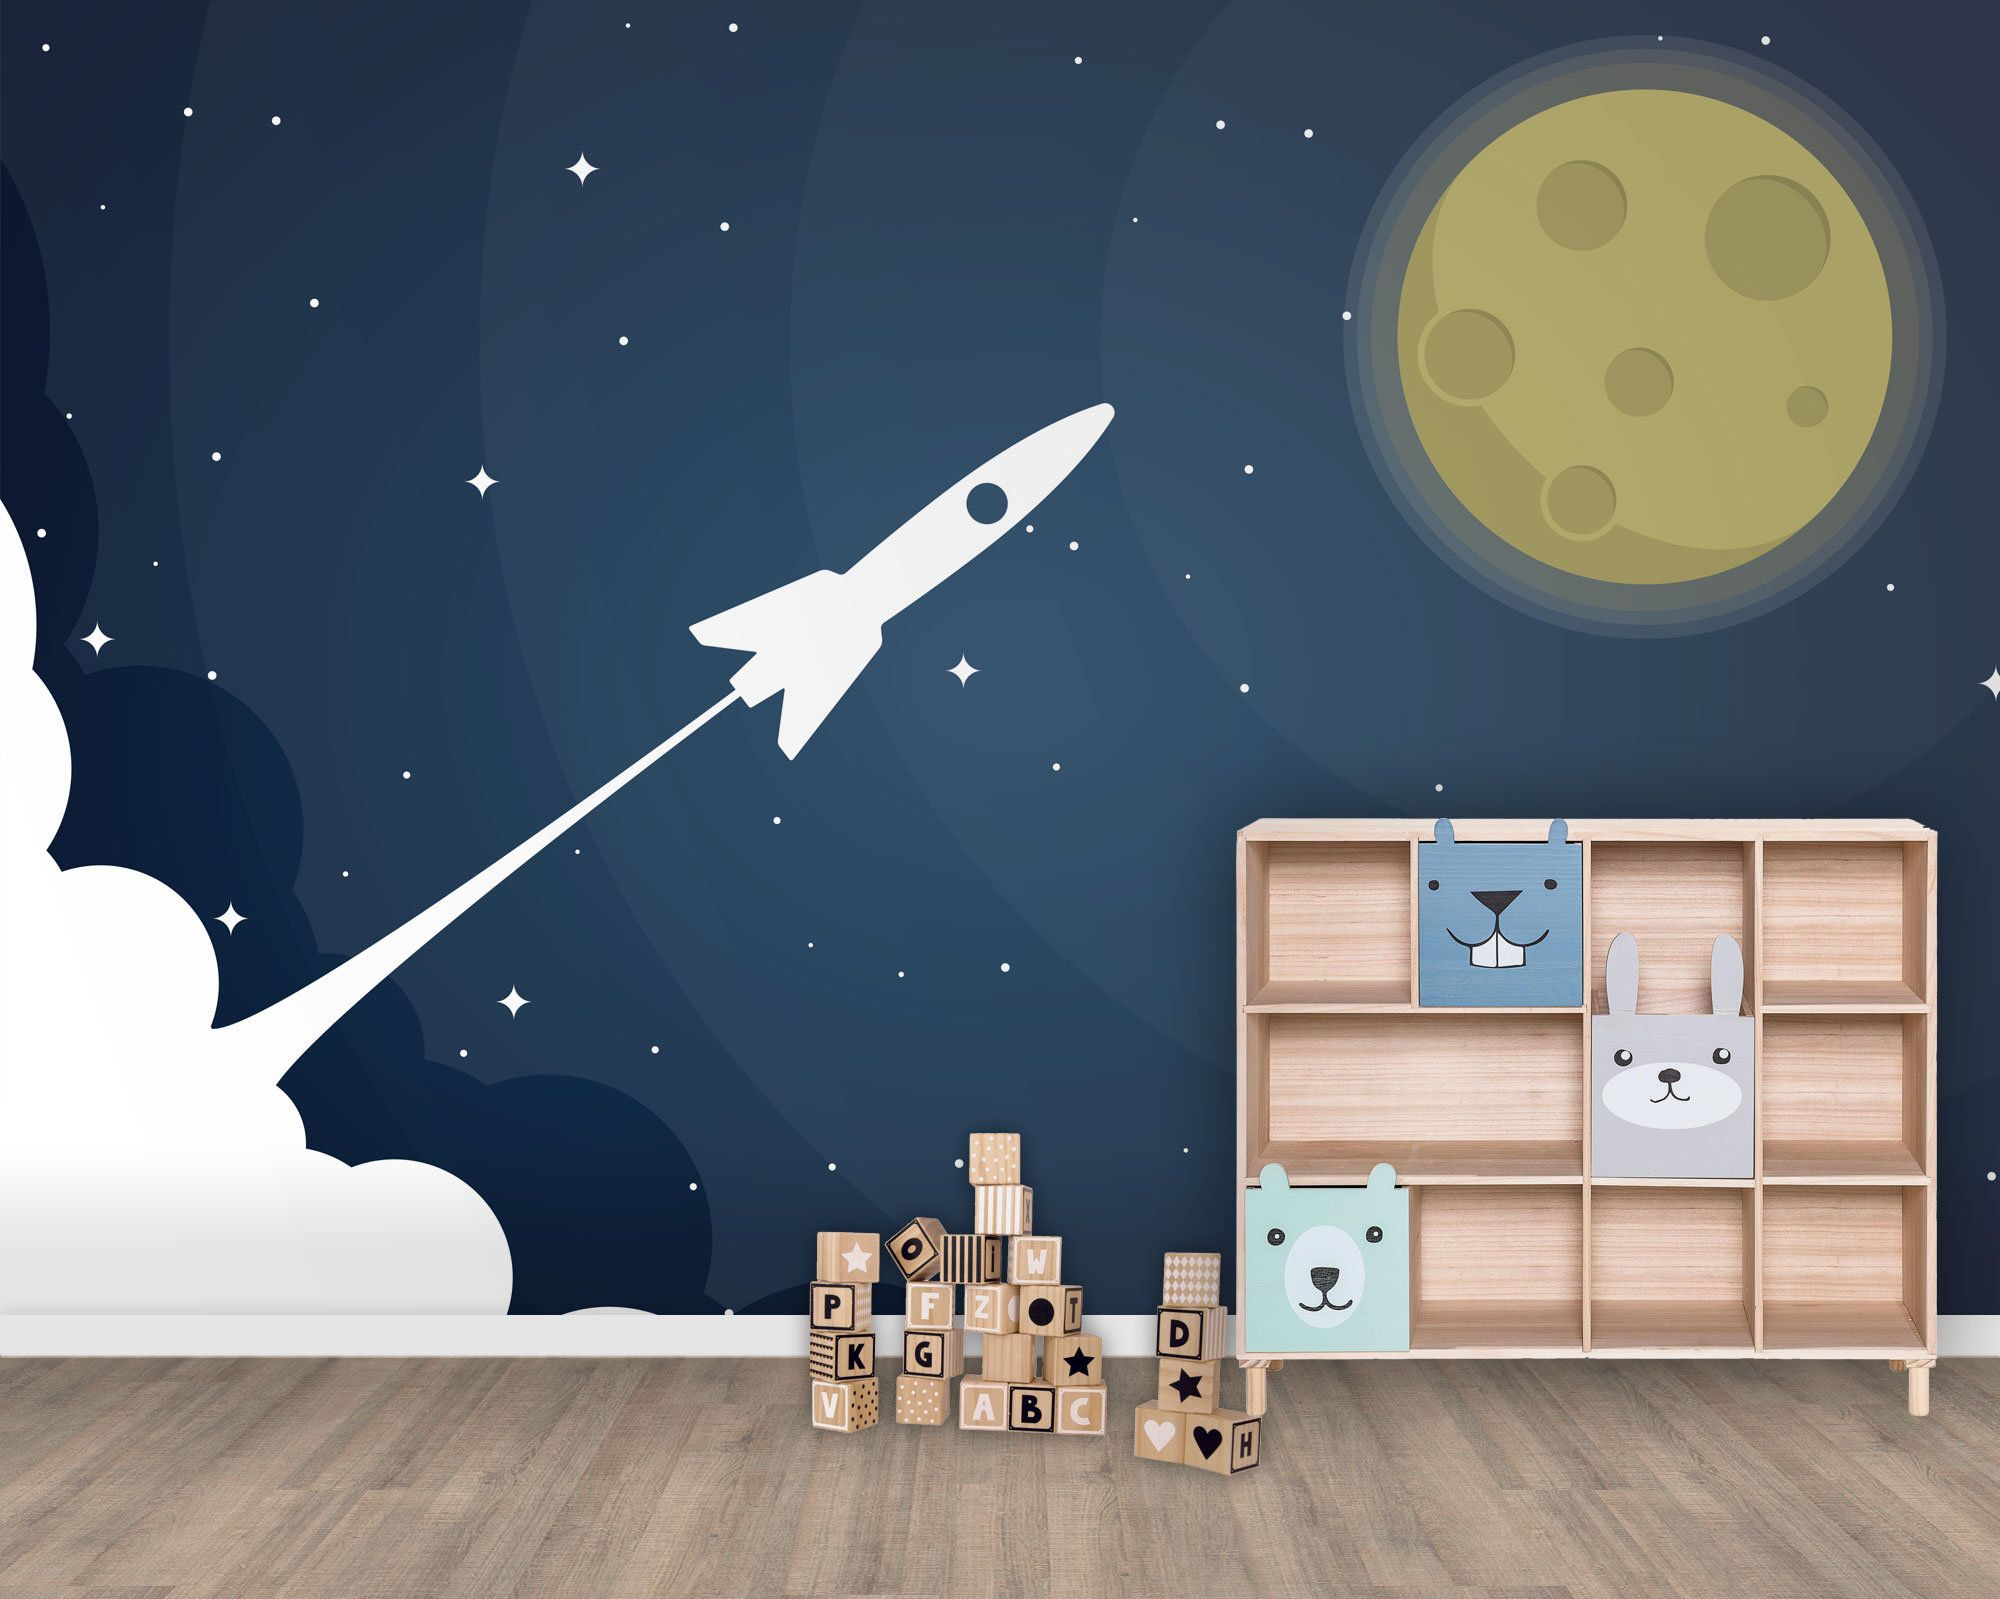 Tapete, Fototapete, Kinderzimmer, Babyzimmer, Mond, Rakete ...